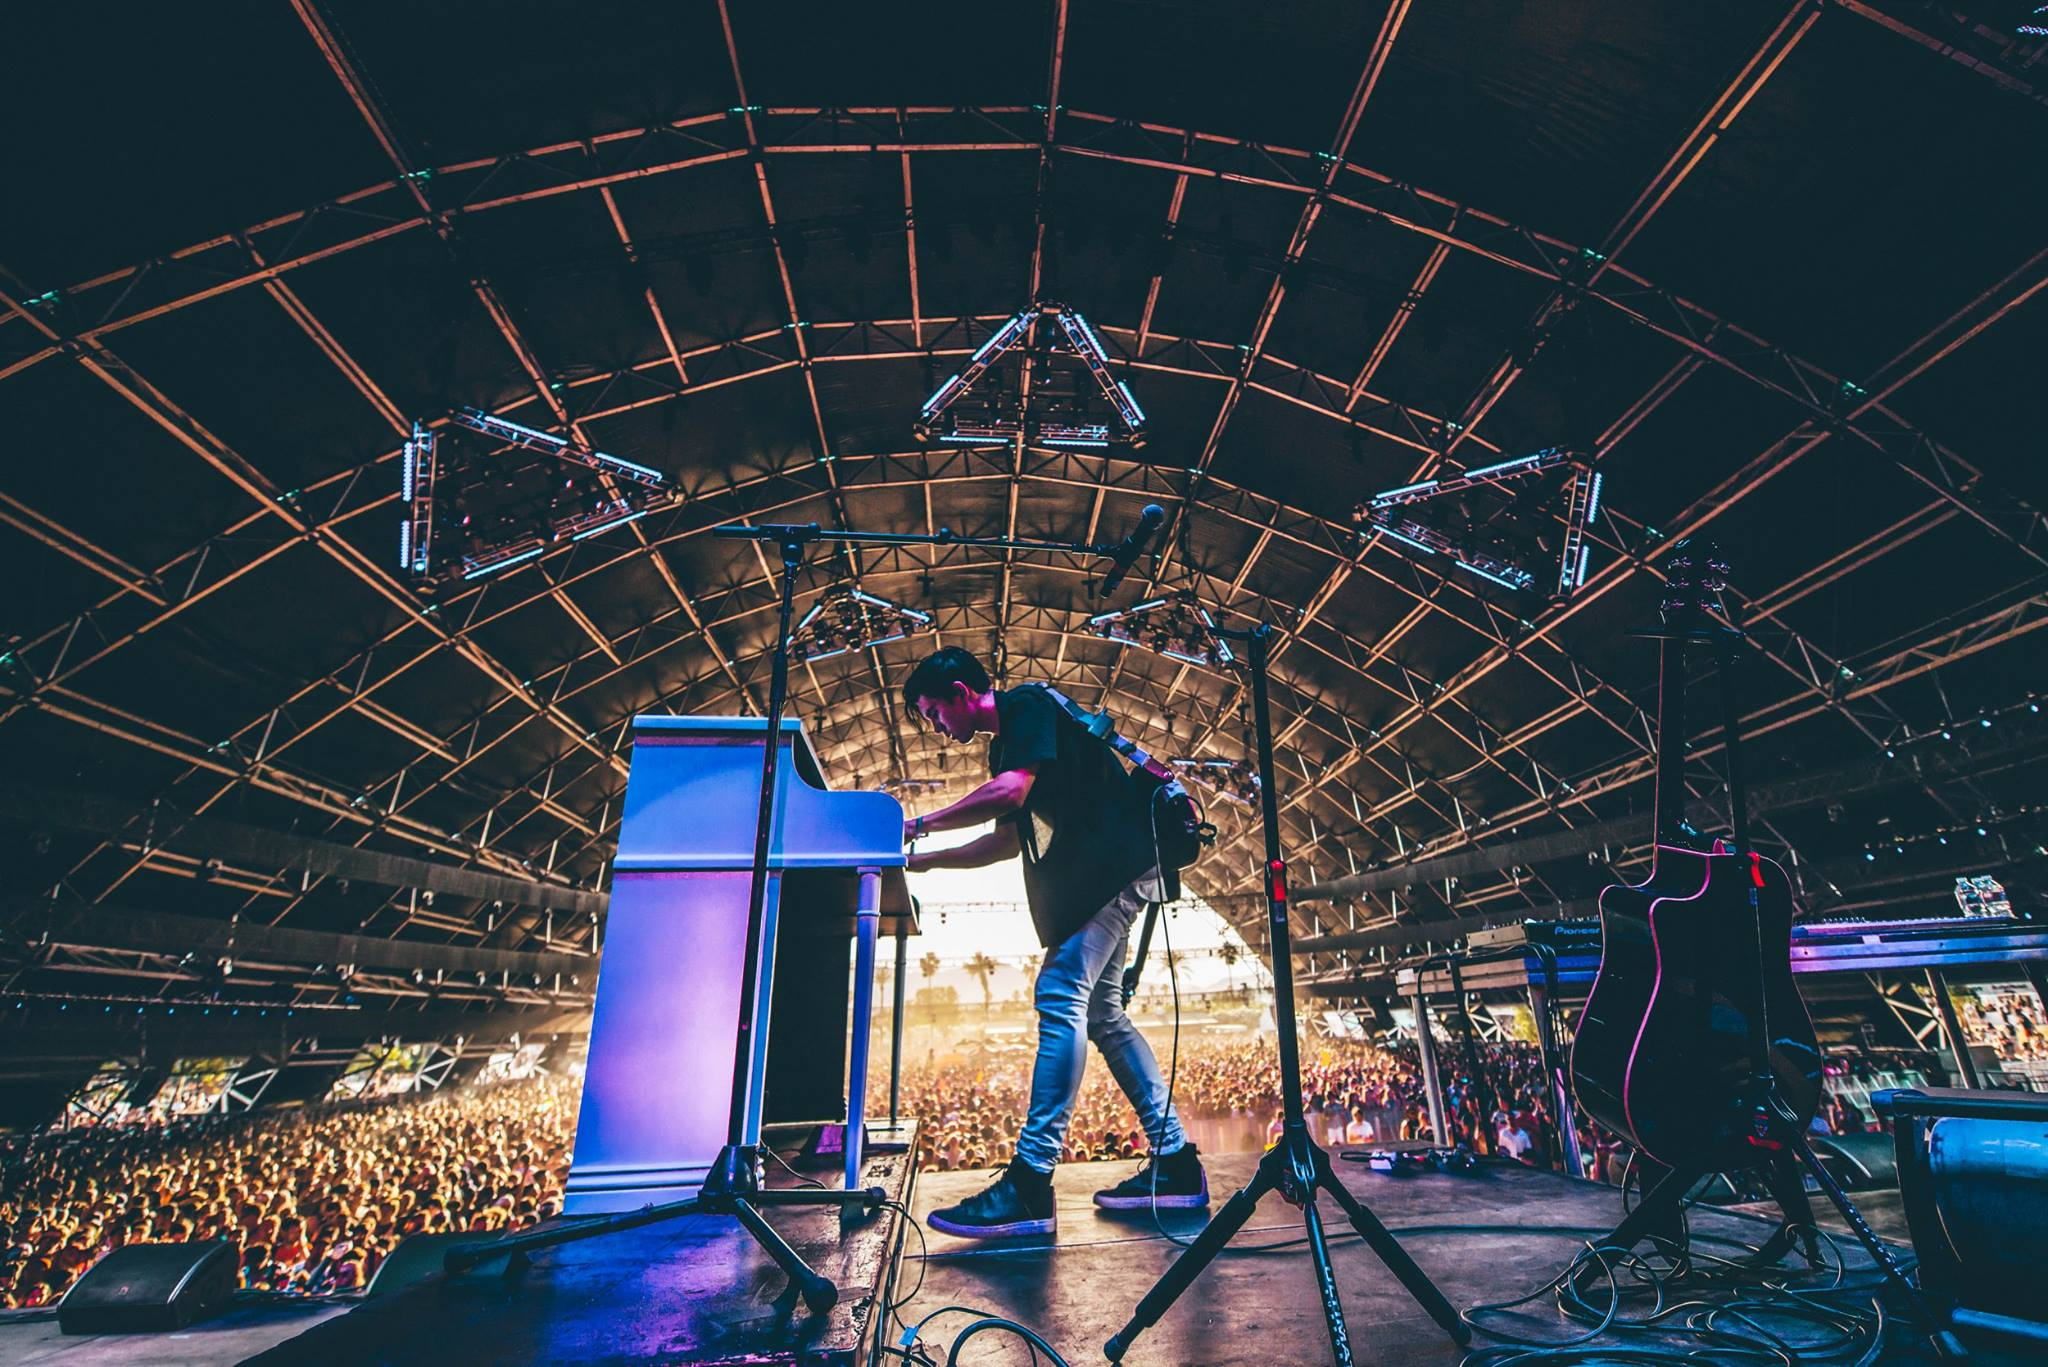 Gryffin Coachella set